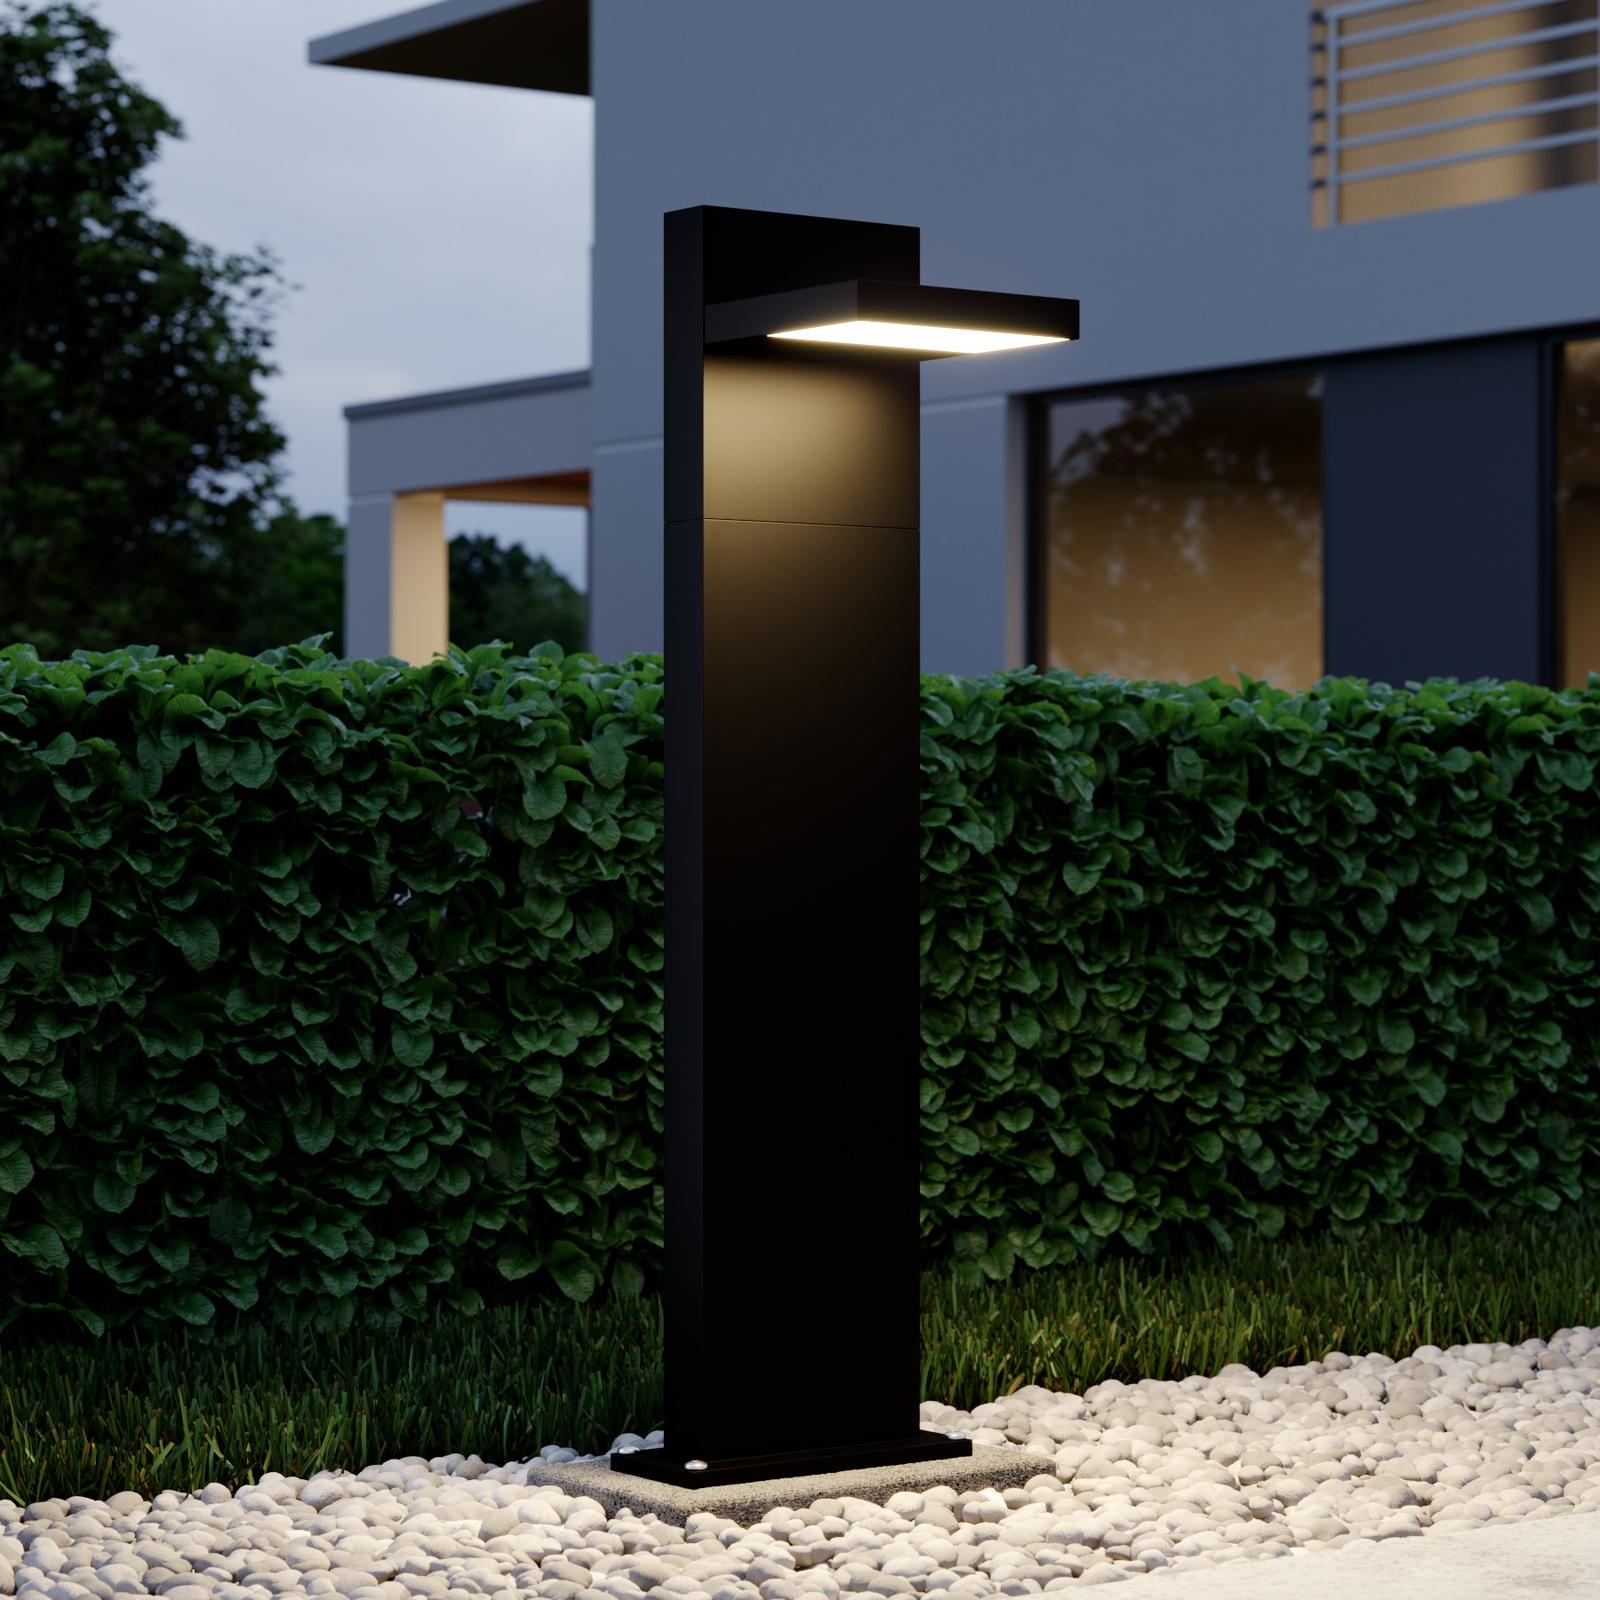 LED-pullertlampe Silvan, 65 cm